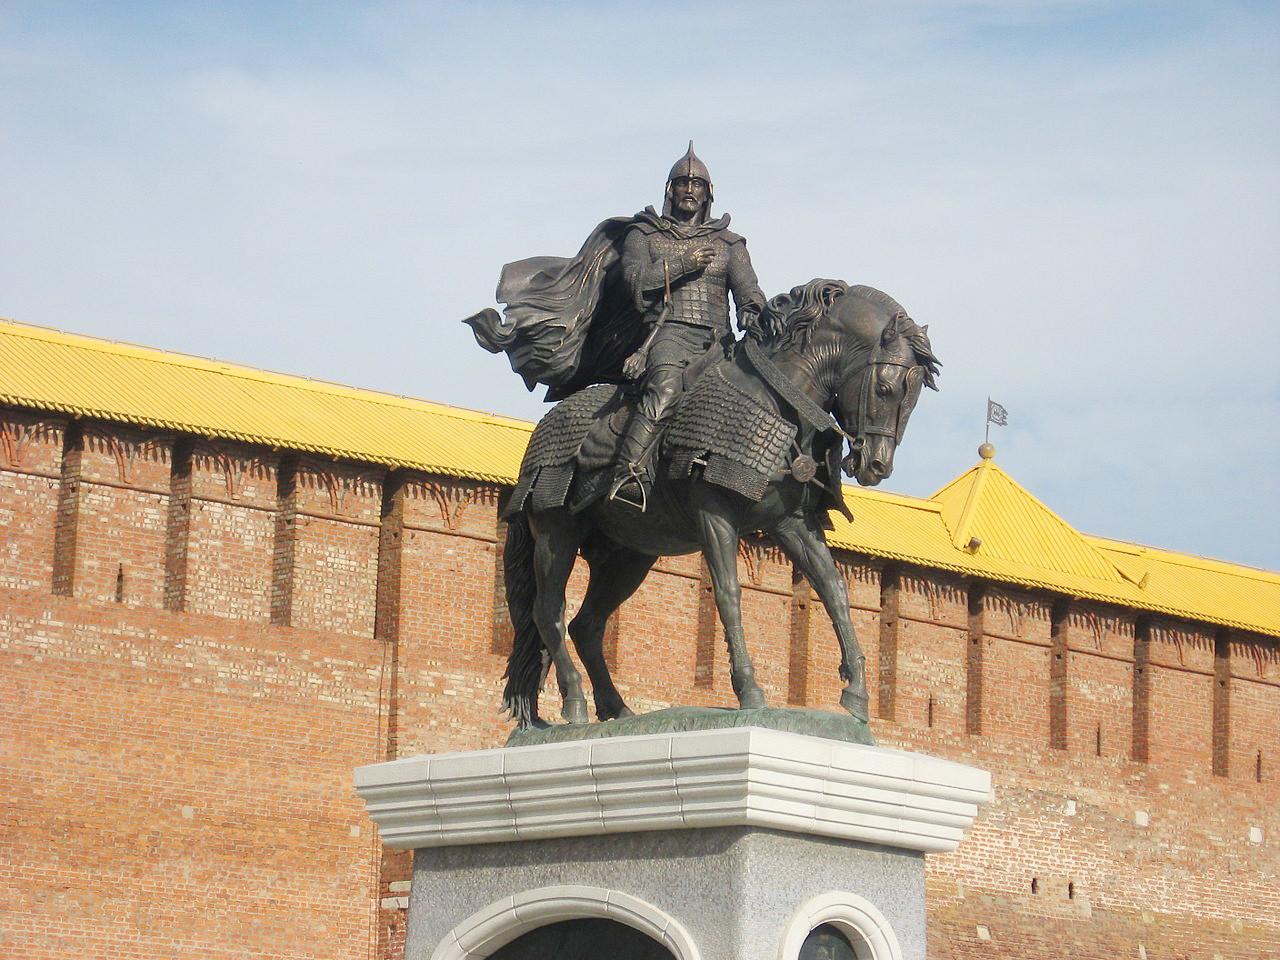 Monumen Dmitry Donskoy di luar Kolomna Kremlin